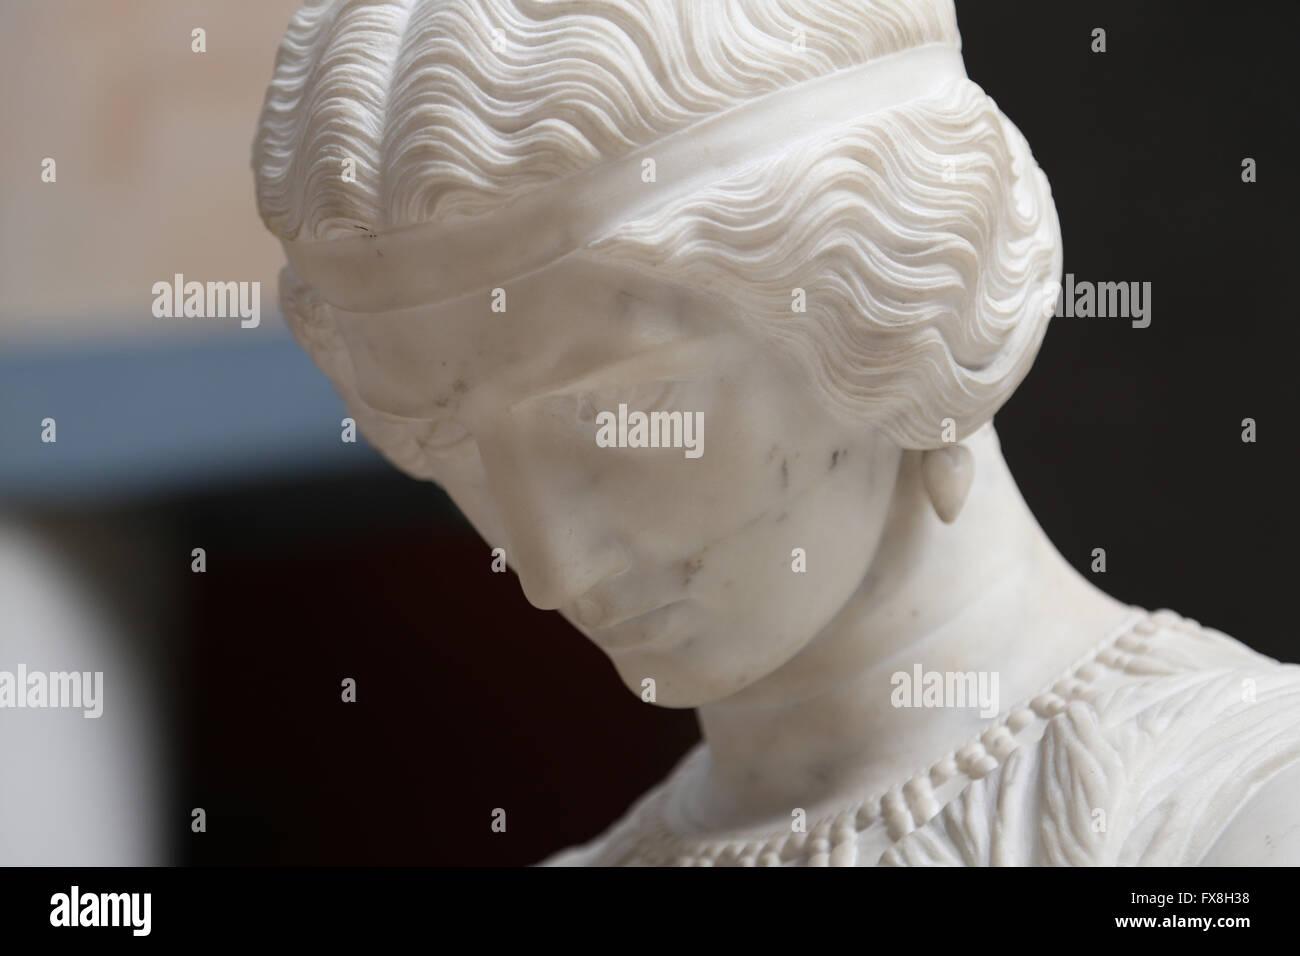 Poetess Sappho, 1852. Marble statue by James Pradier (1790-1852). Orsay Museum. Paris. France. Stock Photo